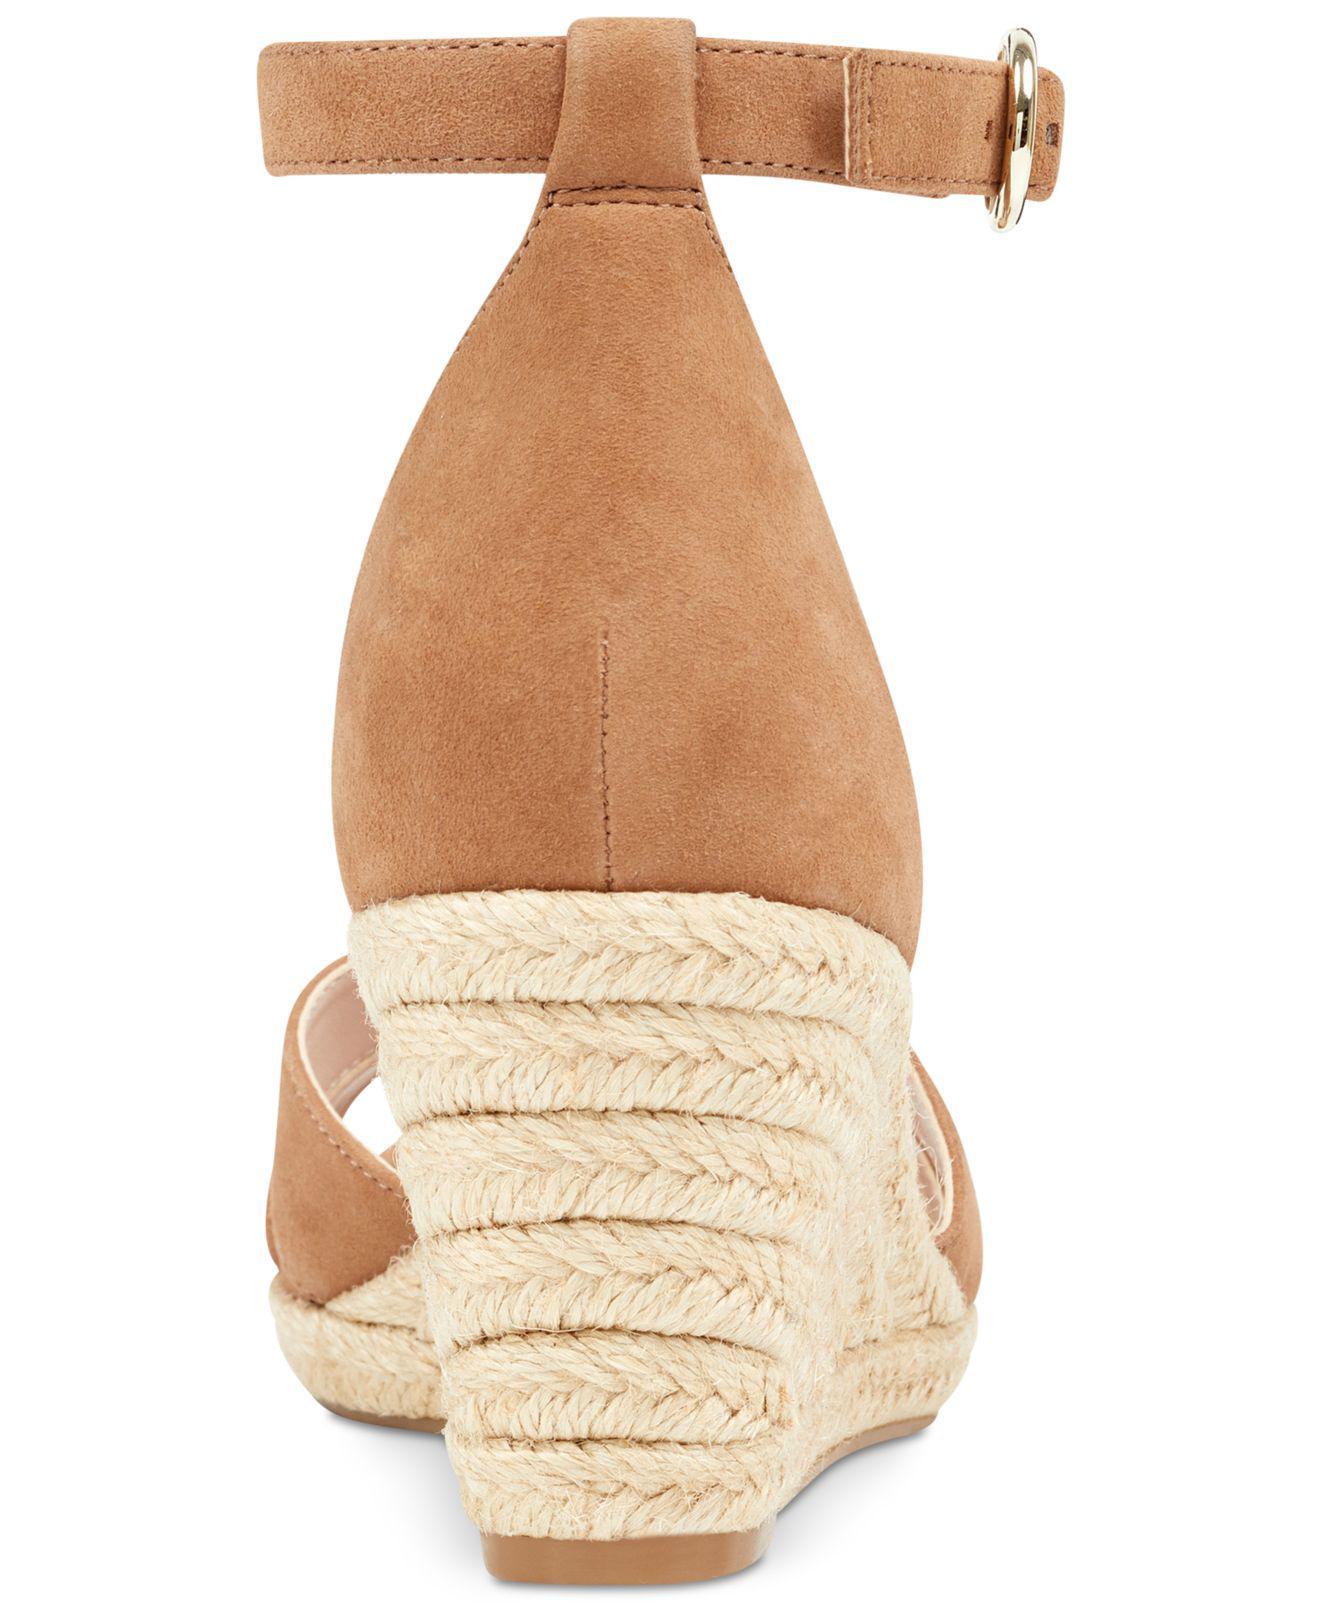 f4c2498462 Nine West Jeranna Wedge Sandals in Natural - Lyst